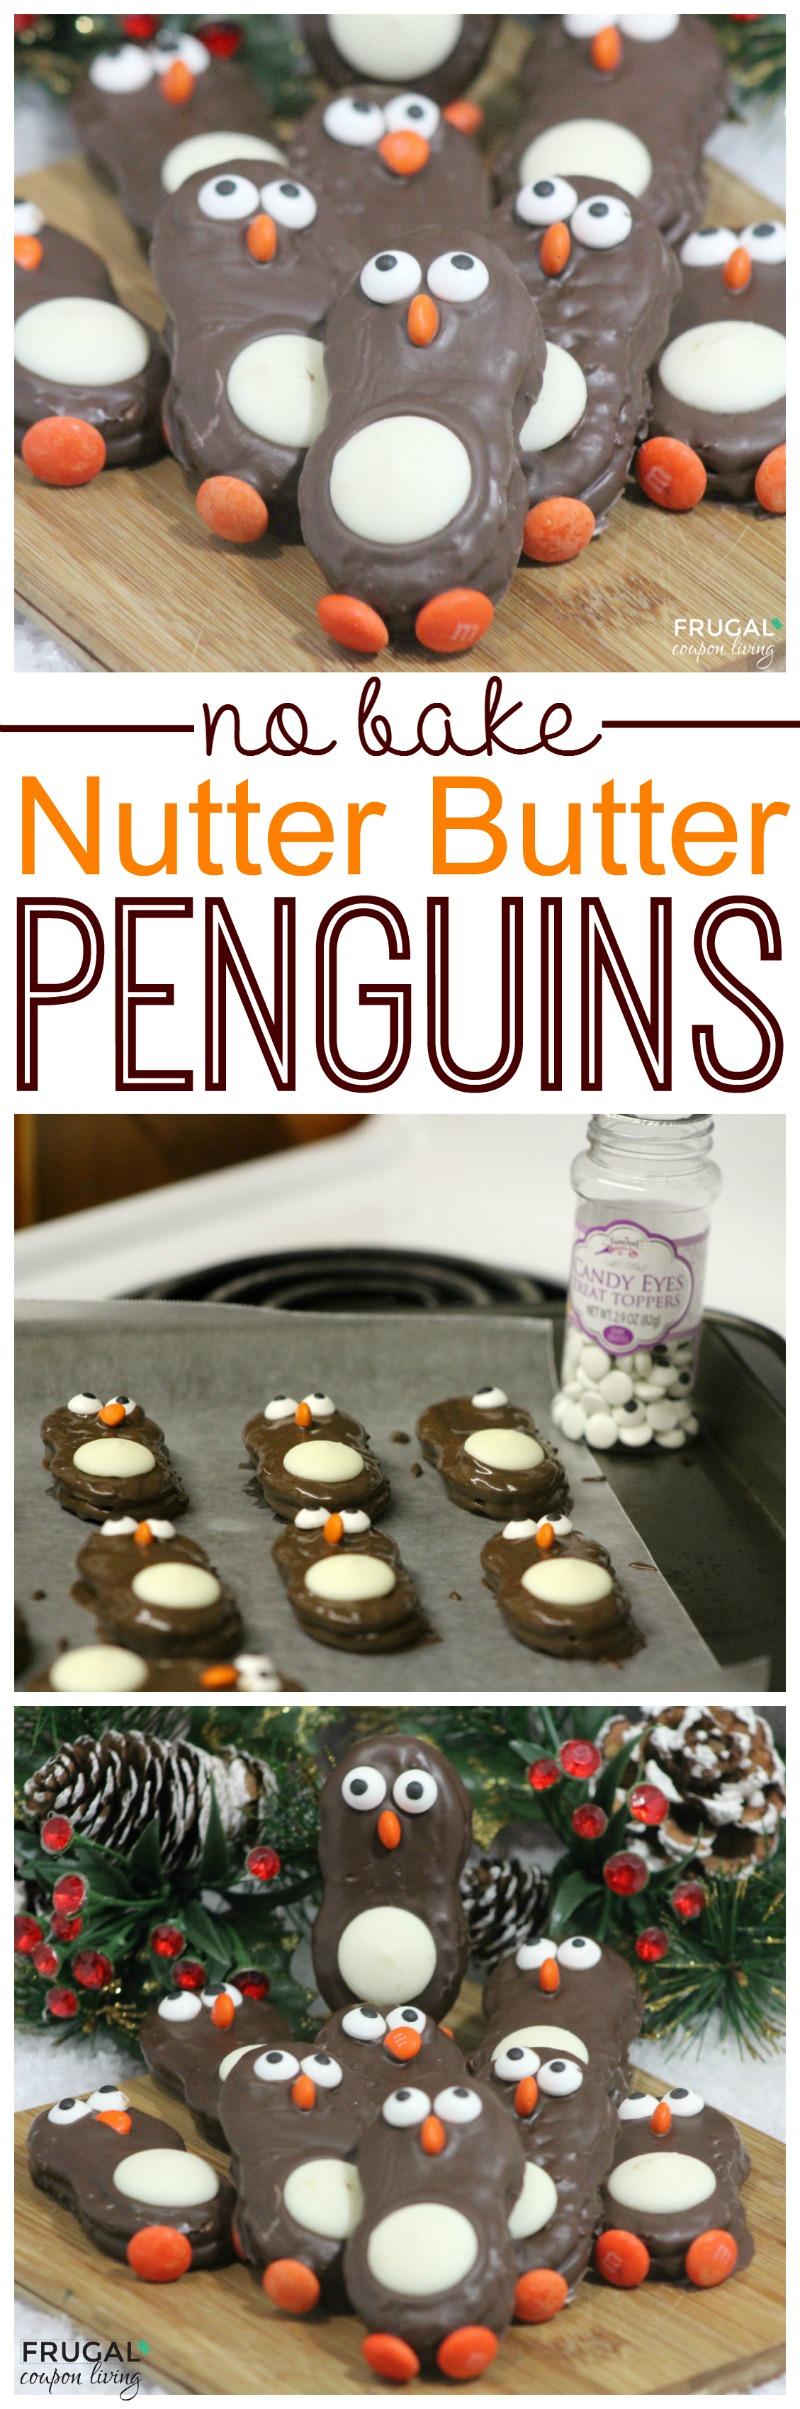 Nutter Butter Penguins Collage on Frugal Coupon Living